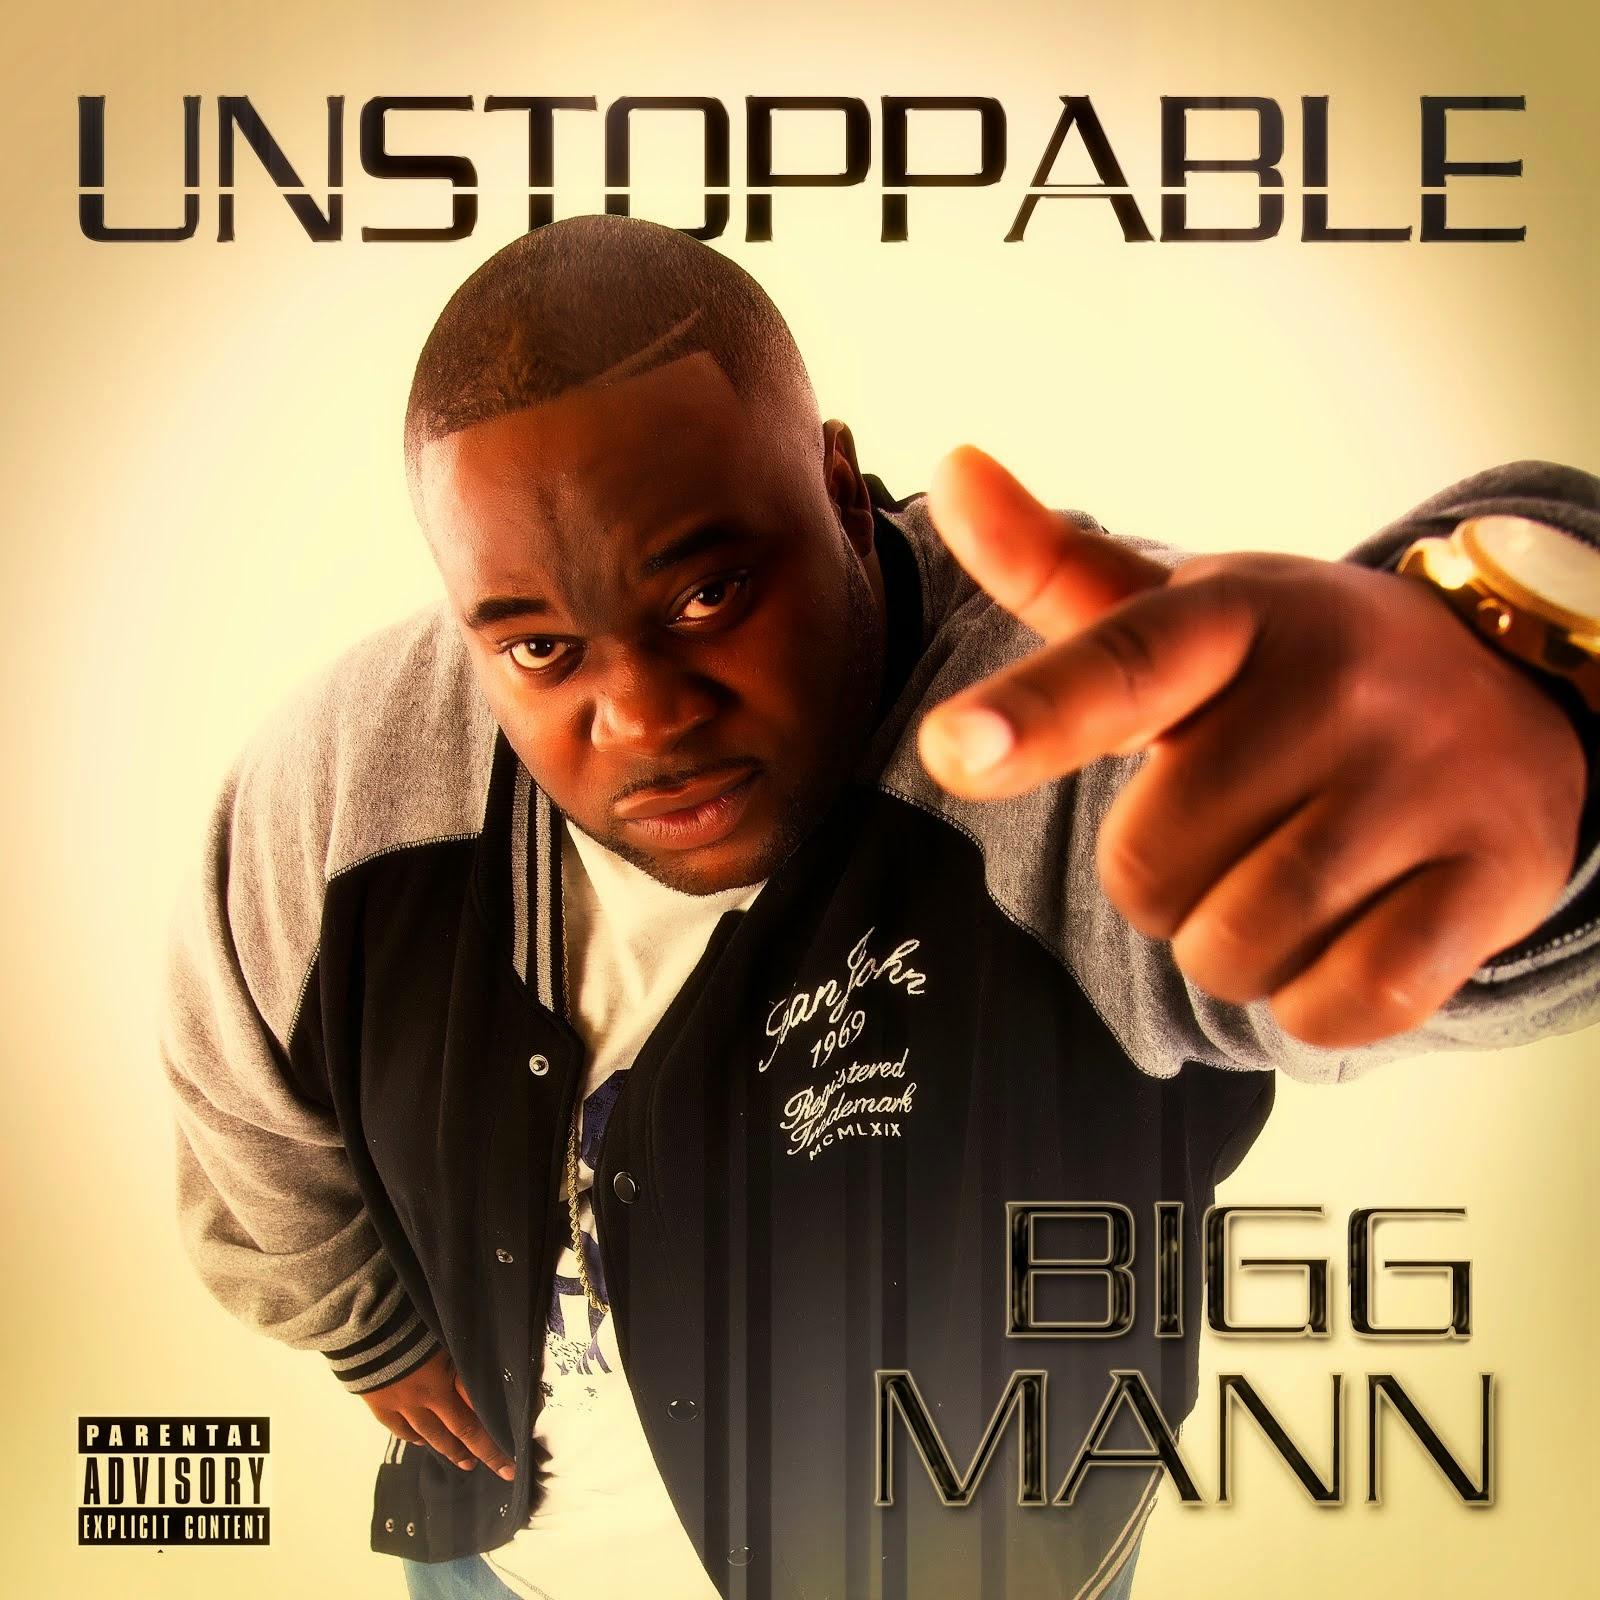 Biggmann's Official Site